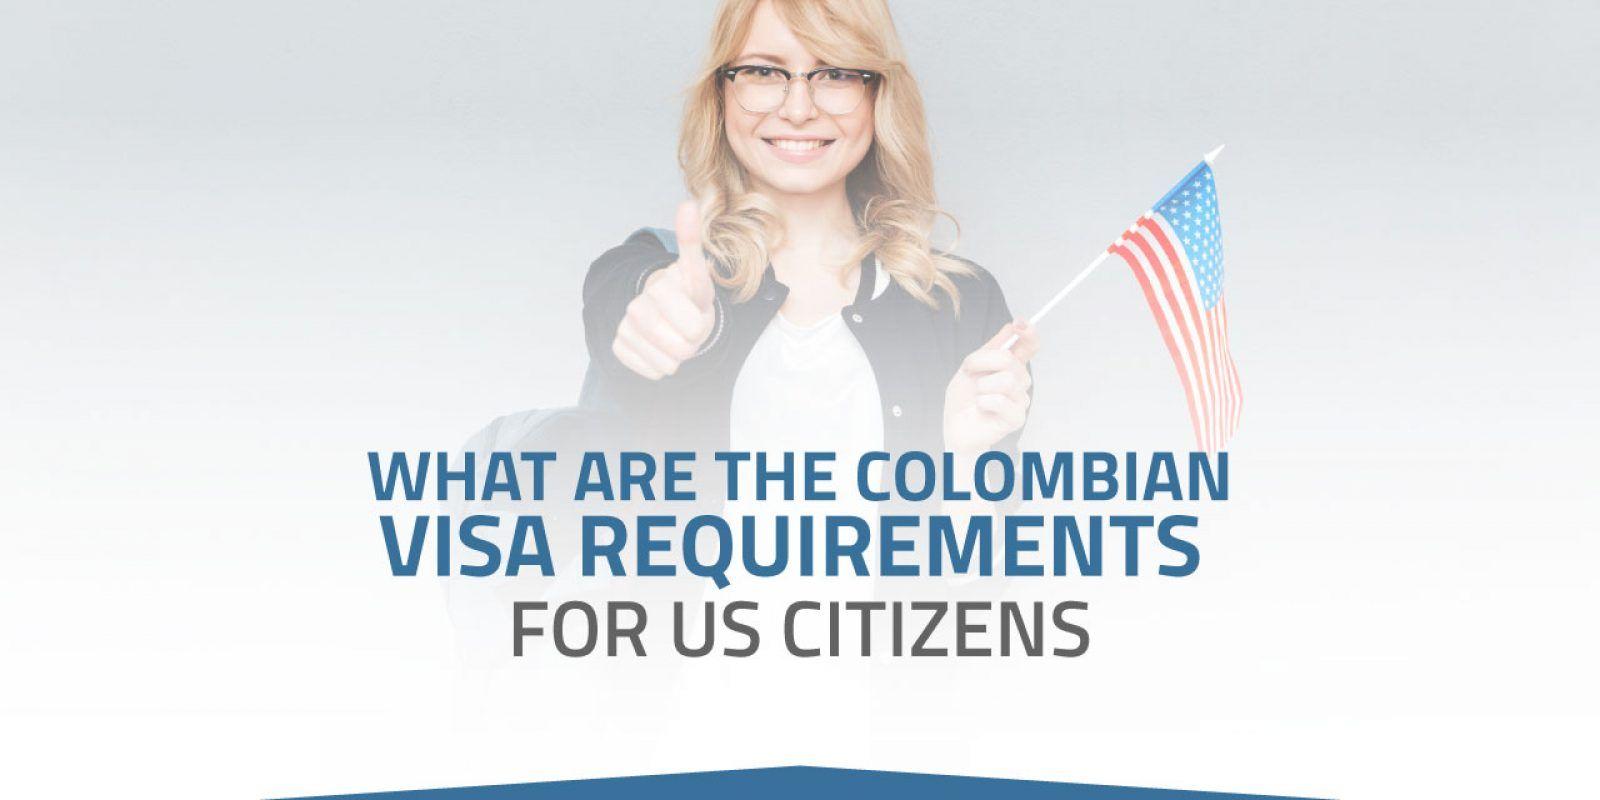 visa requirements us citizens